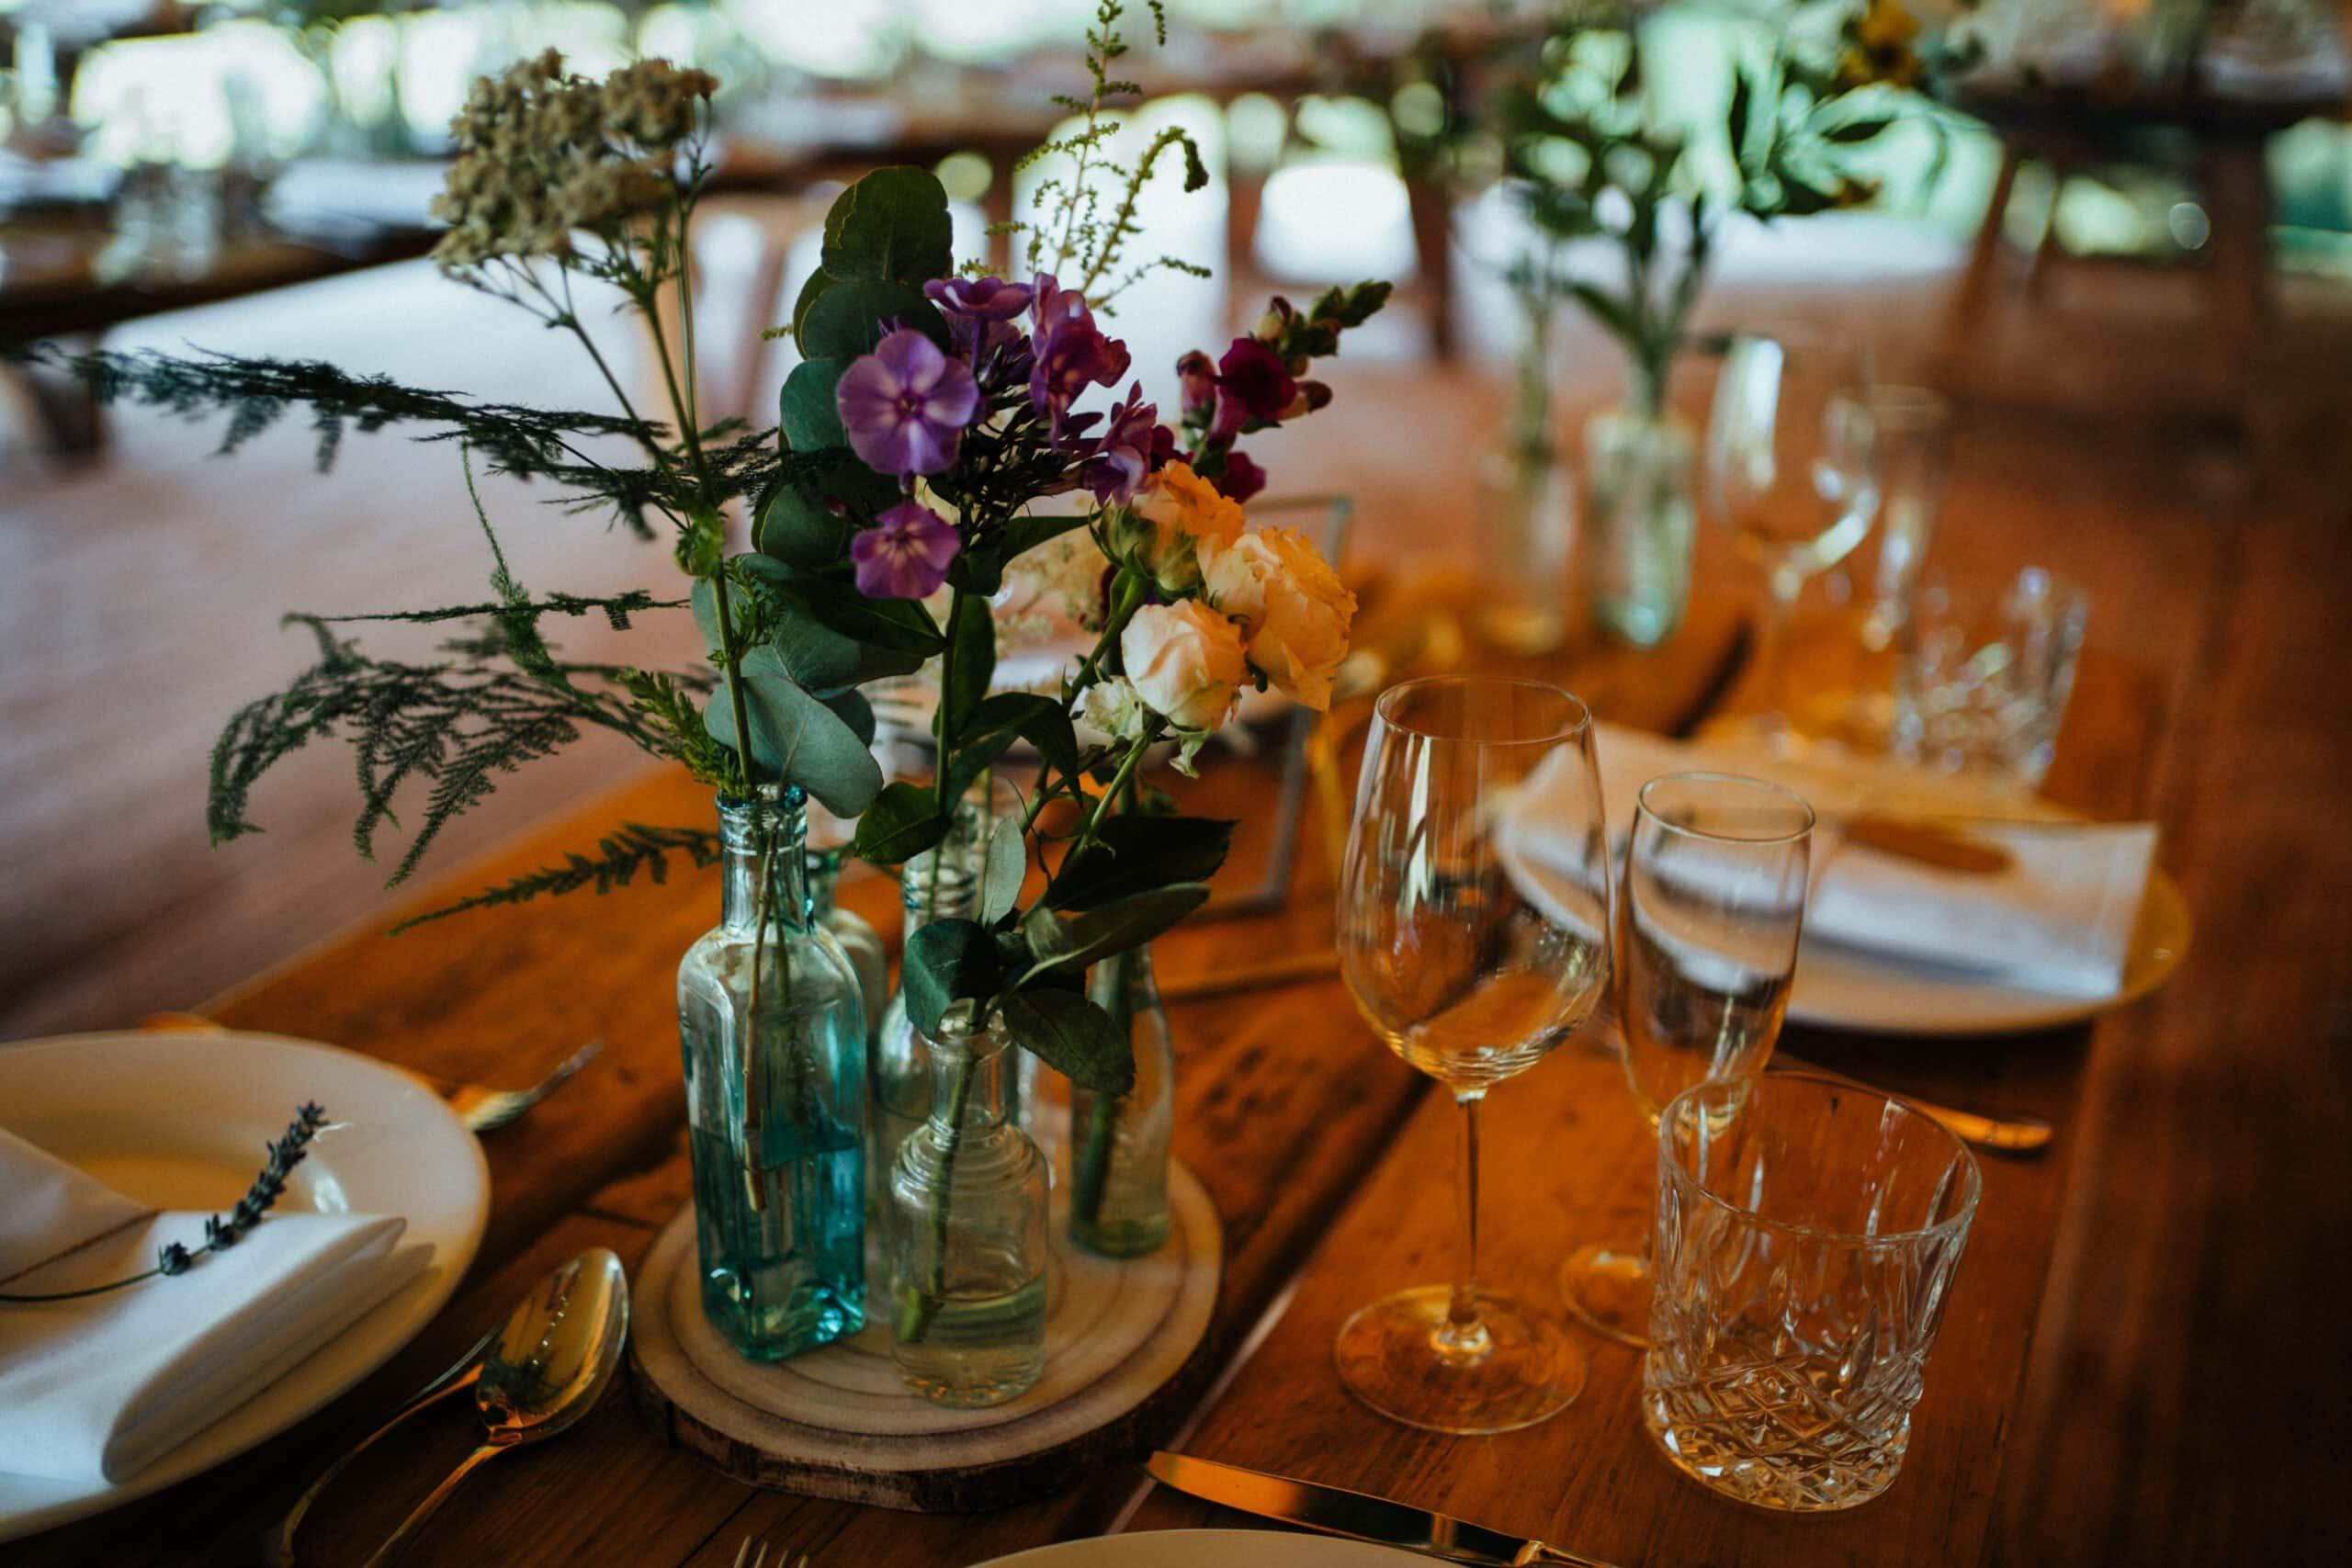 Rustic tipi wedding decorations at Chaucer Barn wedding venue